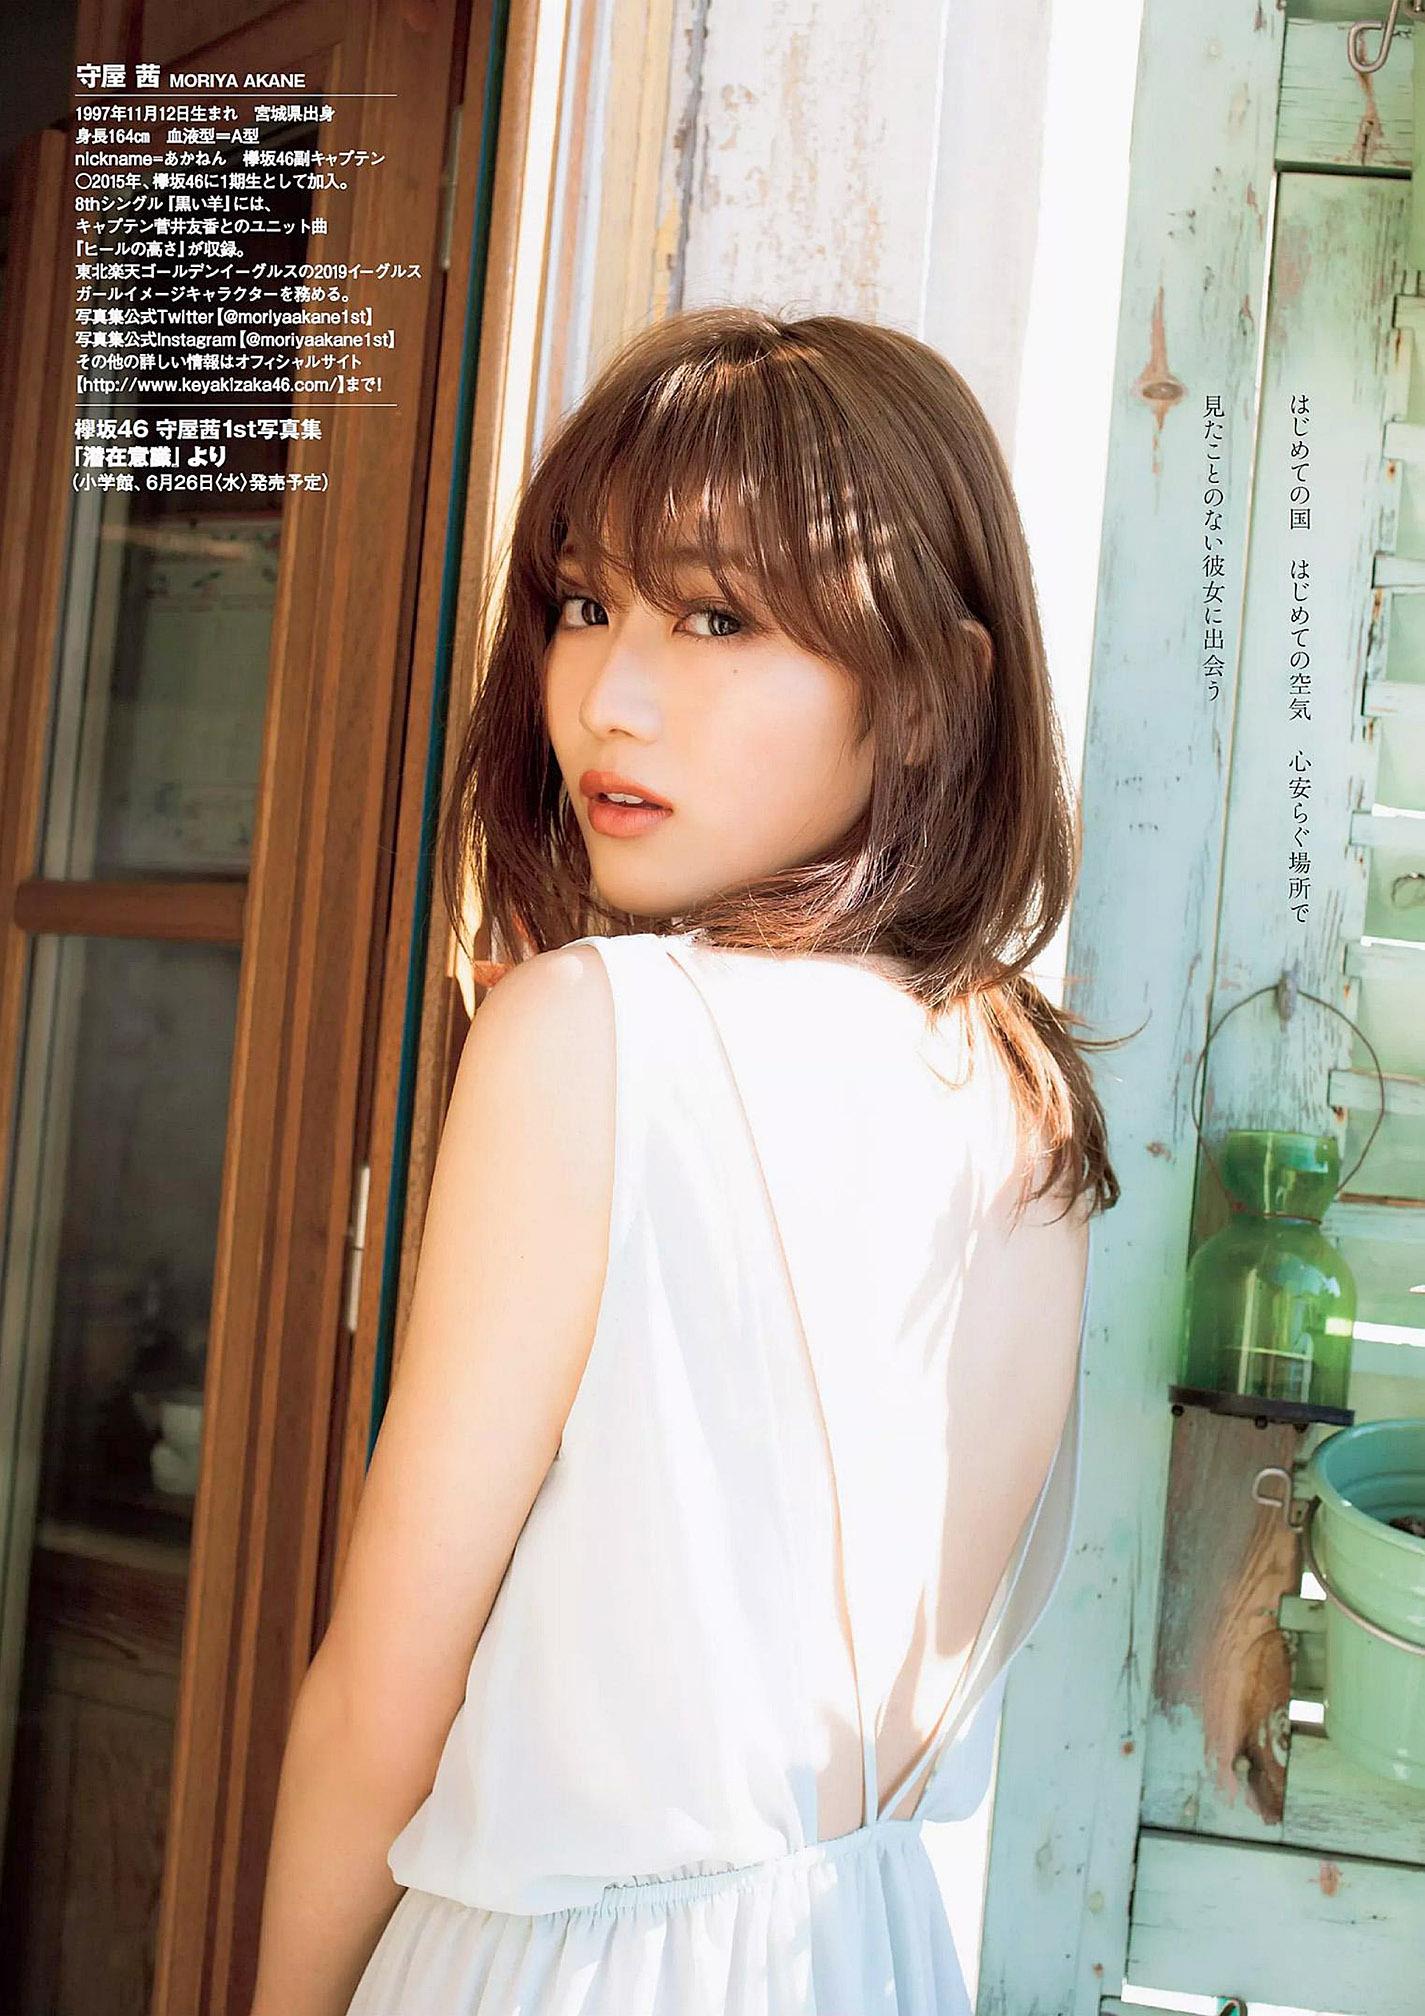 Moriya Akane K46 WPB 190624 04.jpg